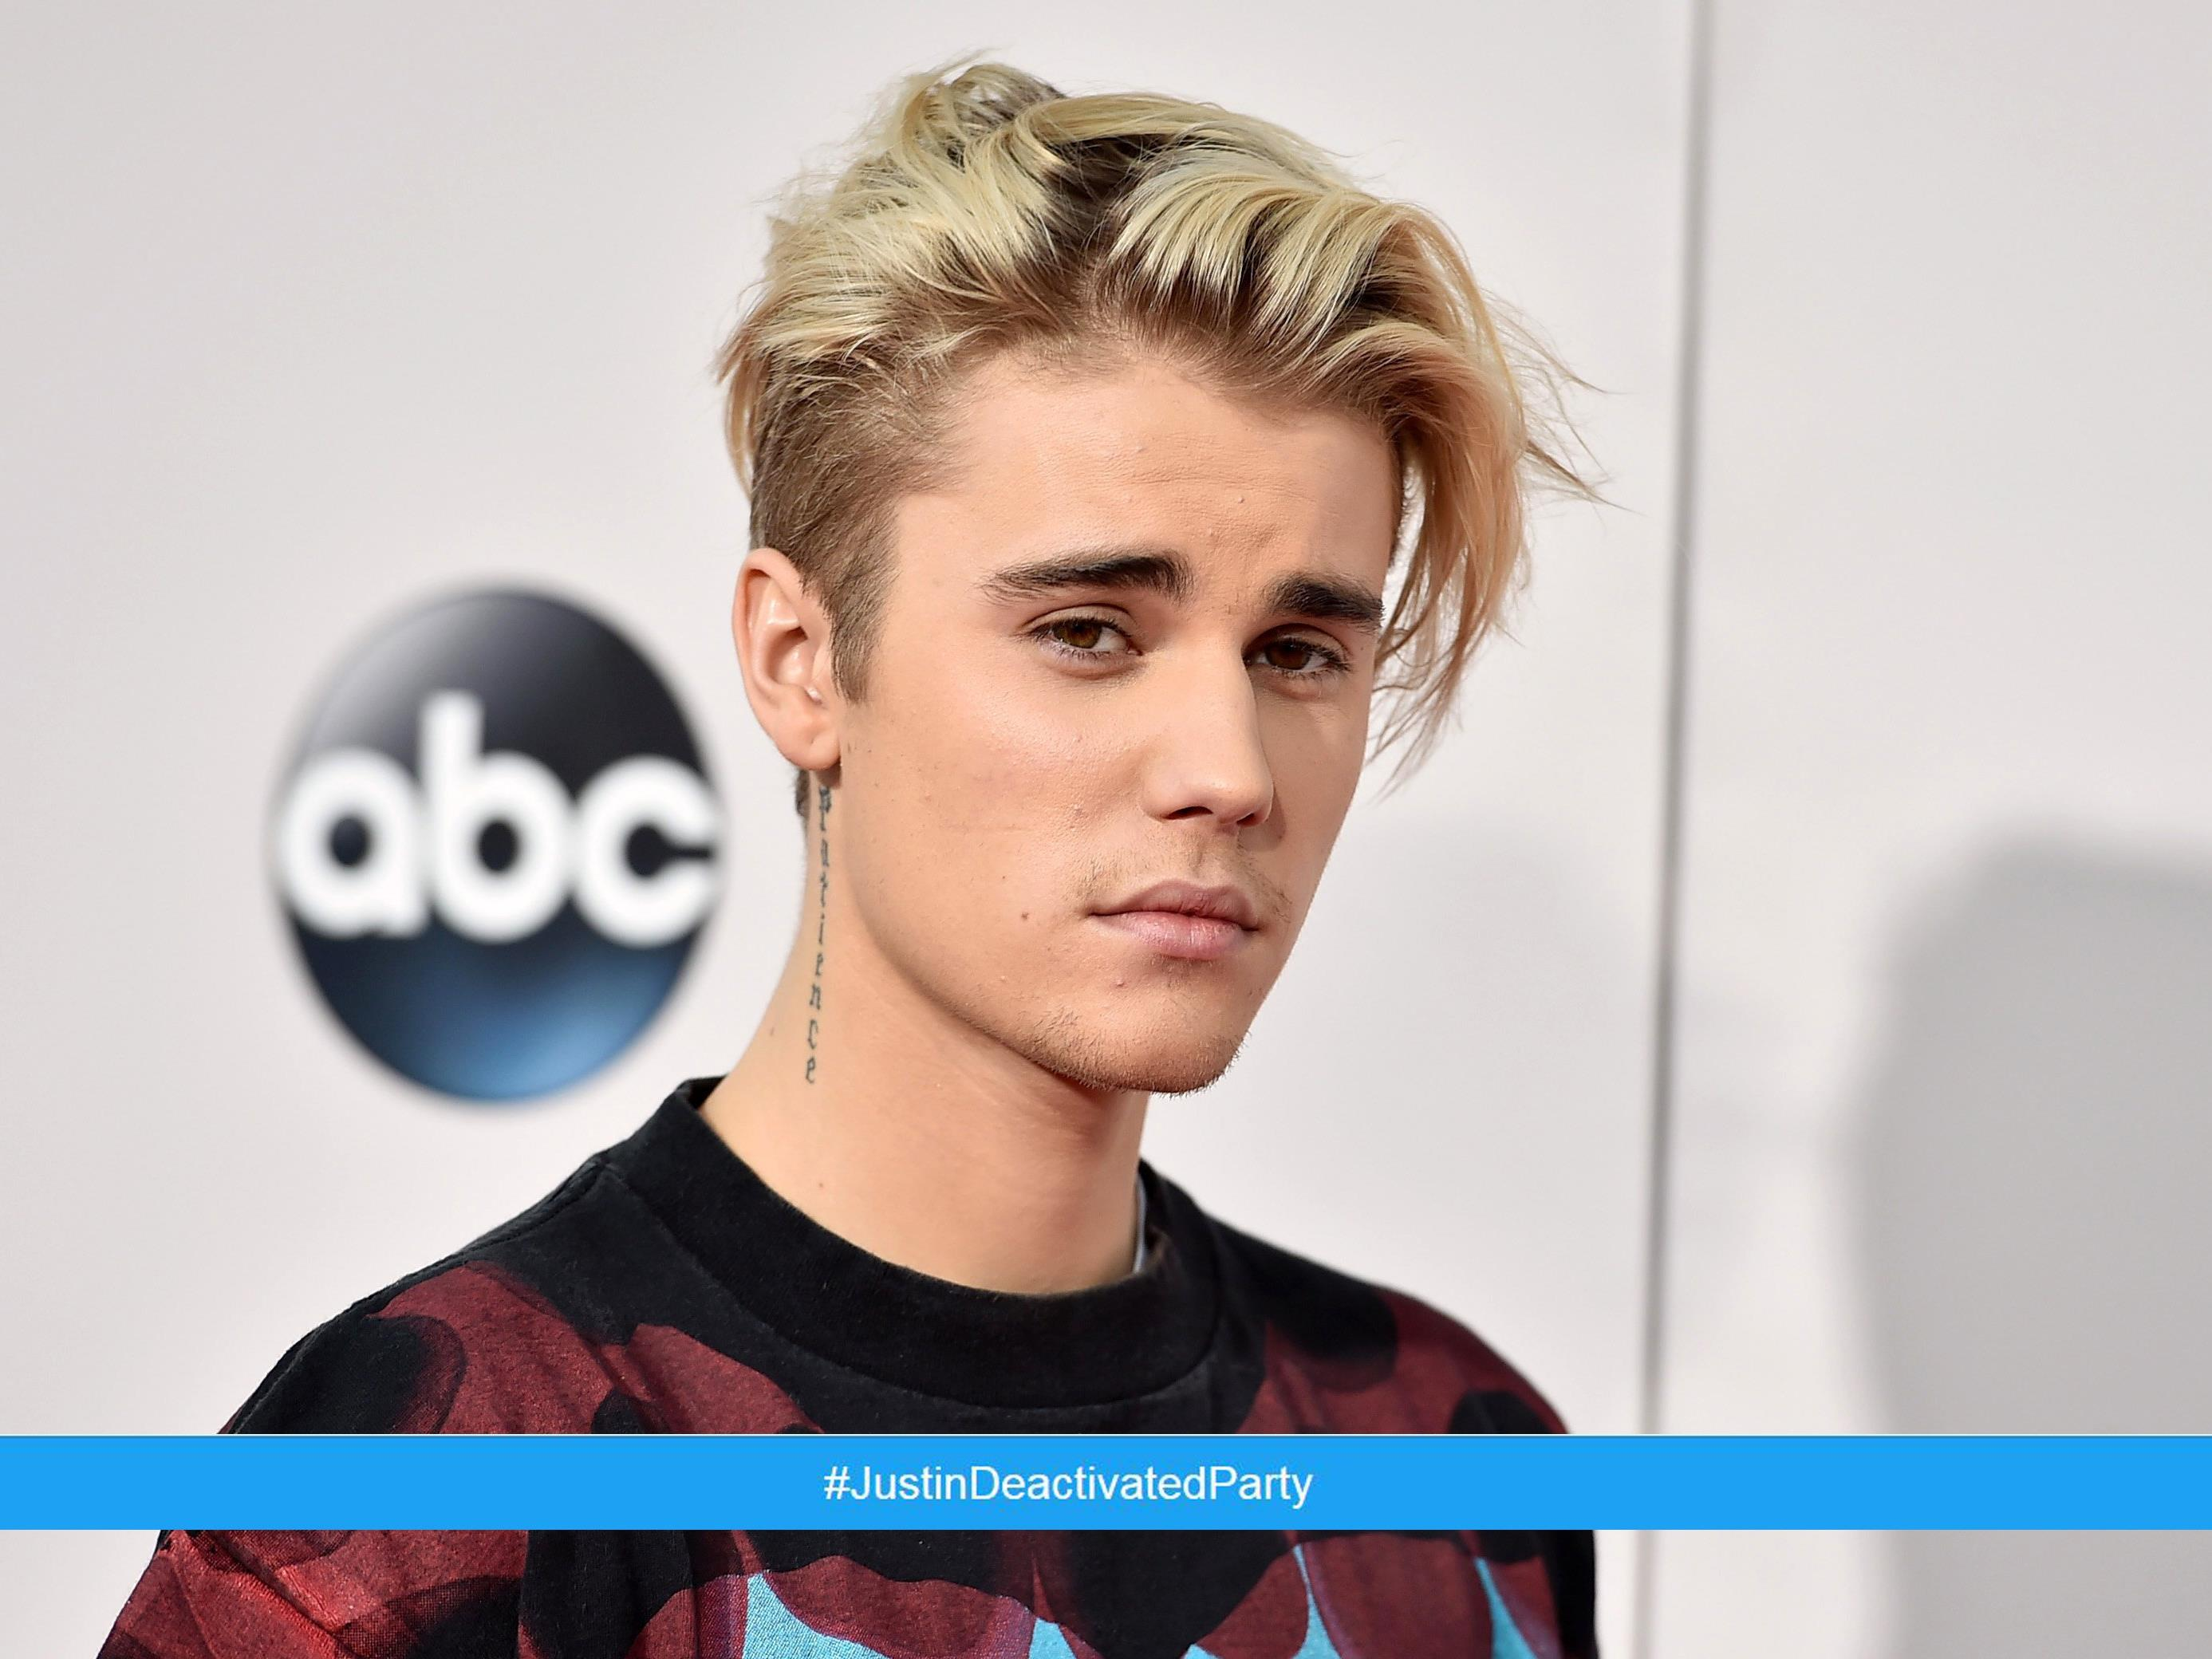 Drama um Justin Biebers Instagram-Aus